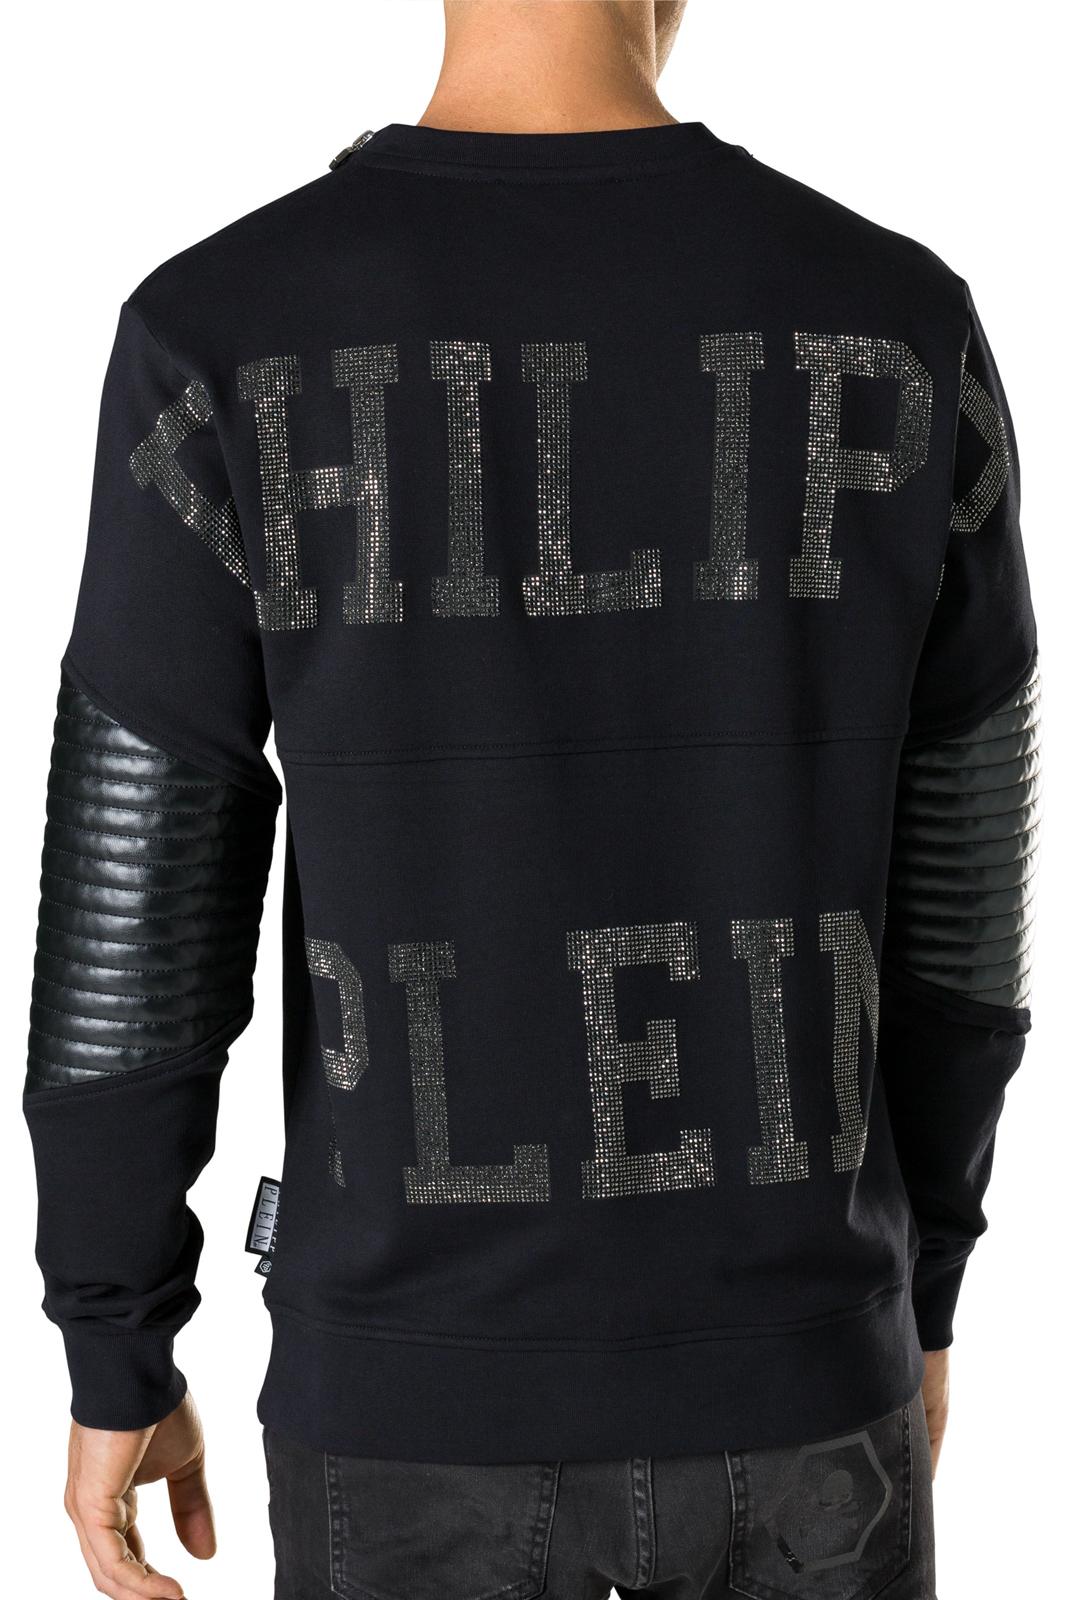 Sweatshirts  Philipp plein A17C MJO0187 PRE 0202 BLACK/BLACK